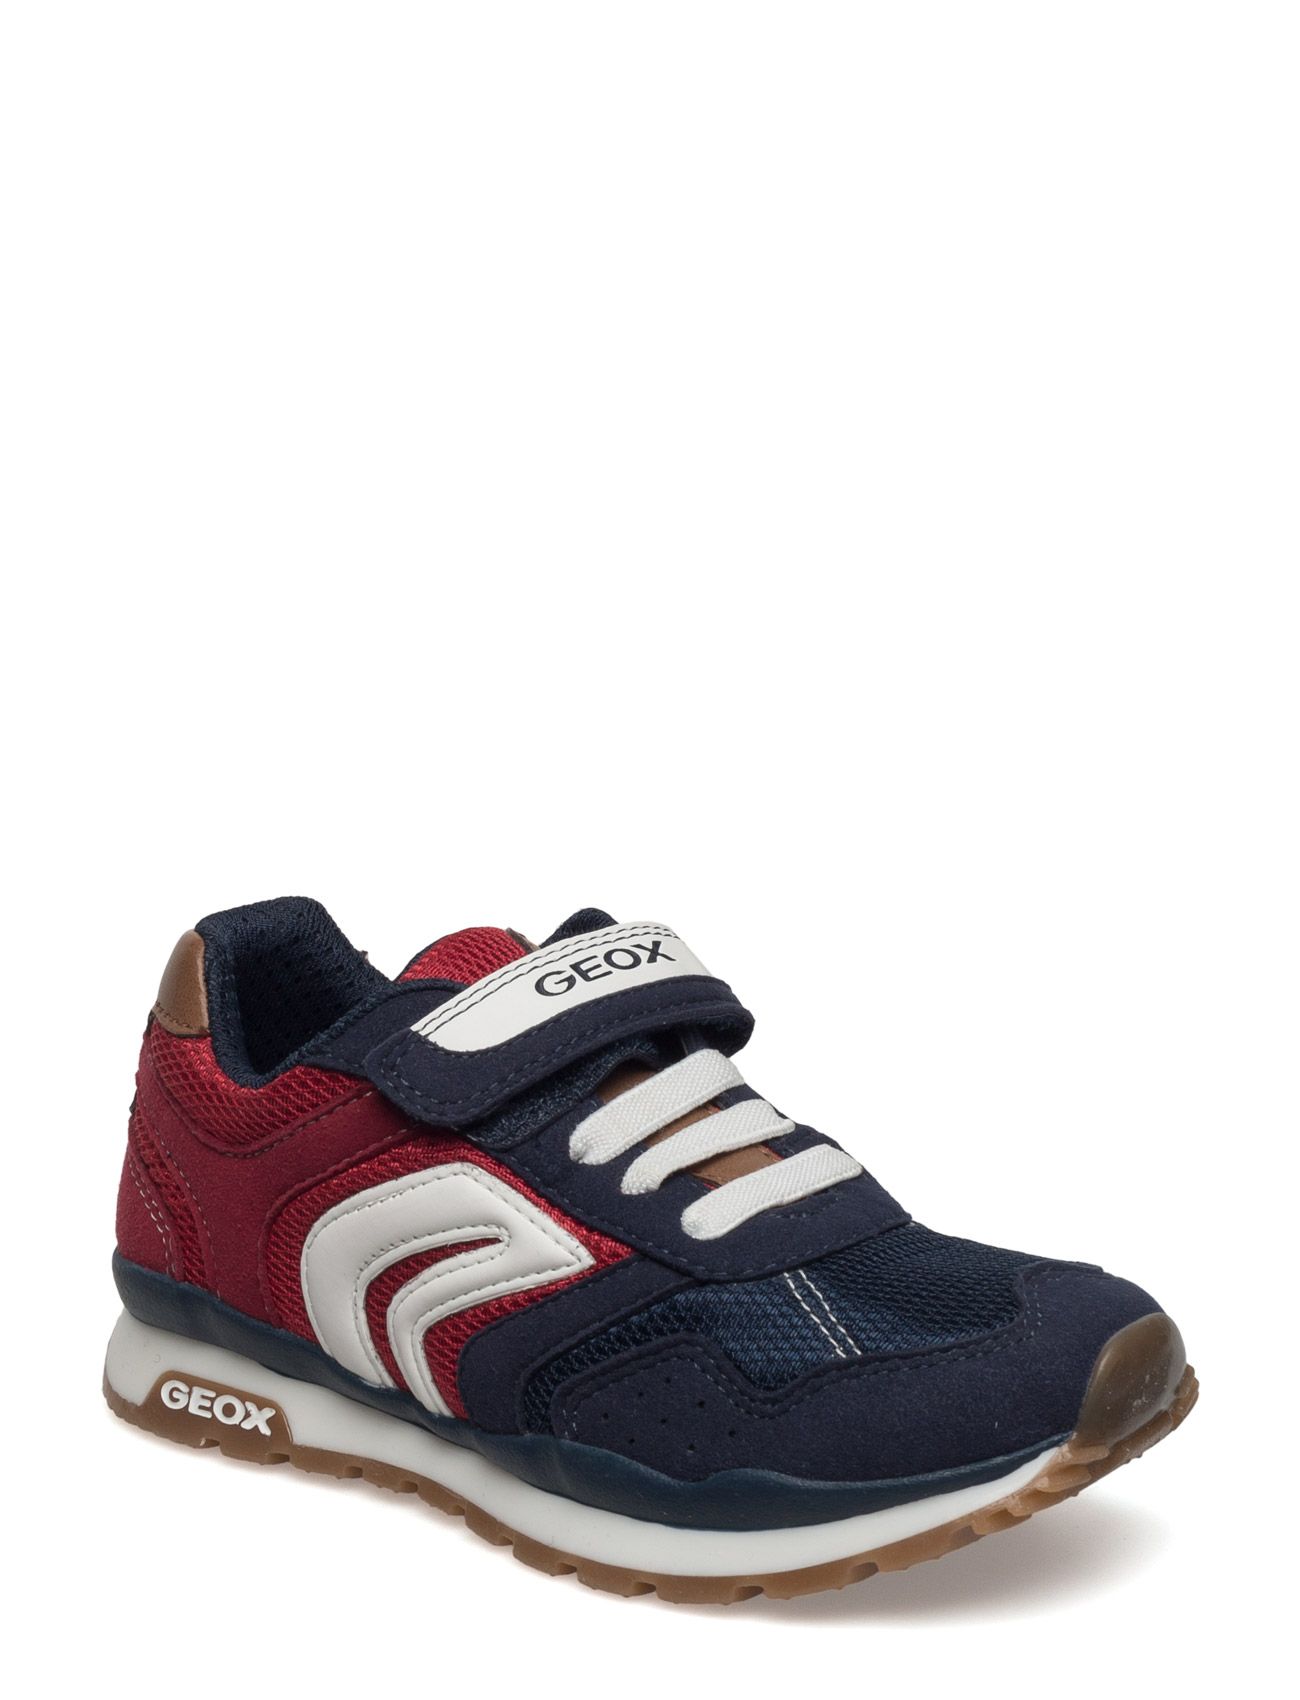 J Pavel GEOX Sko & Sneakers til Børn i